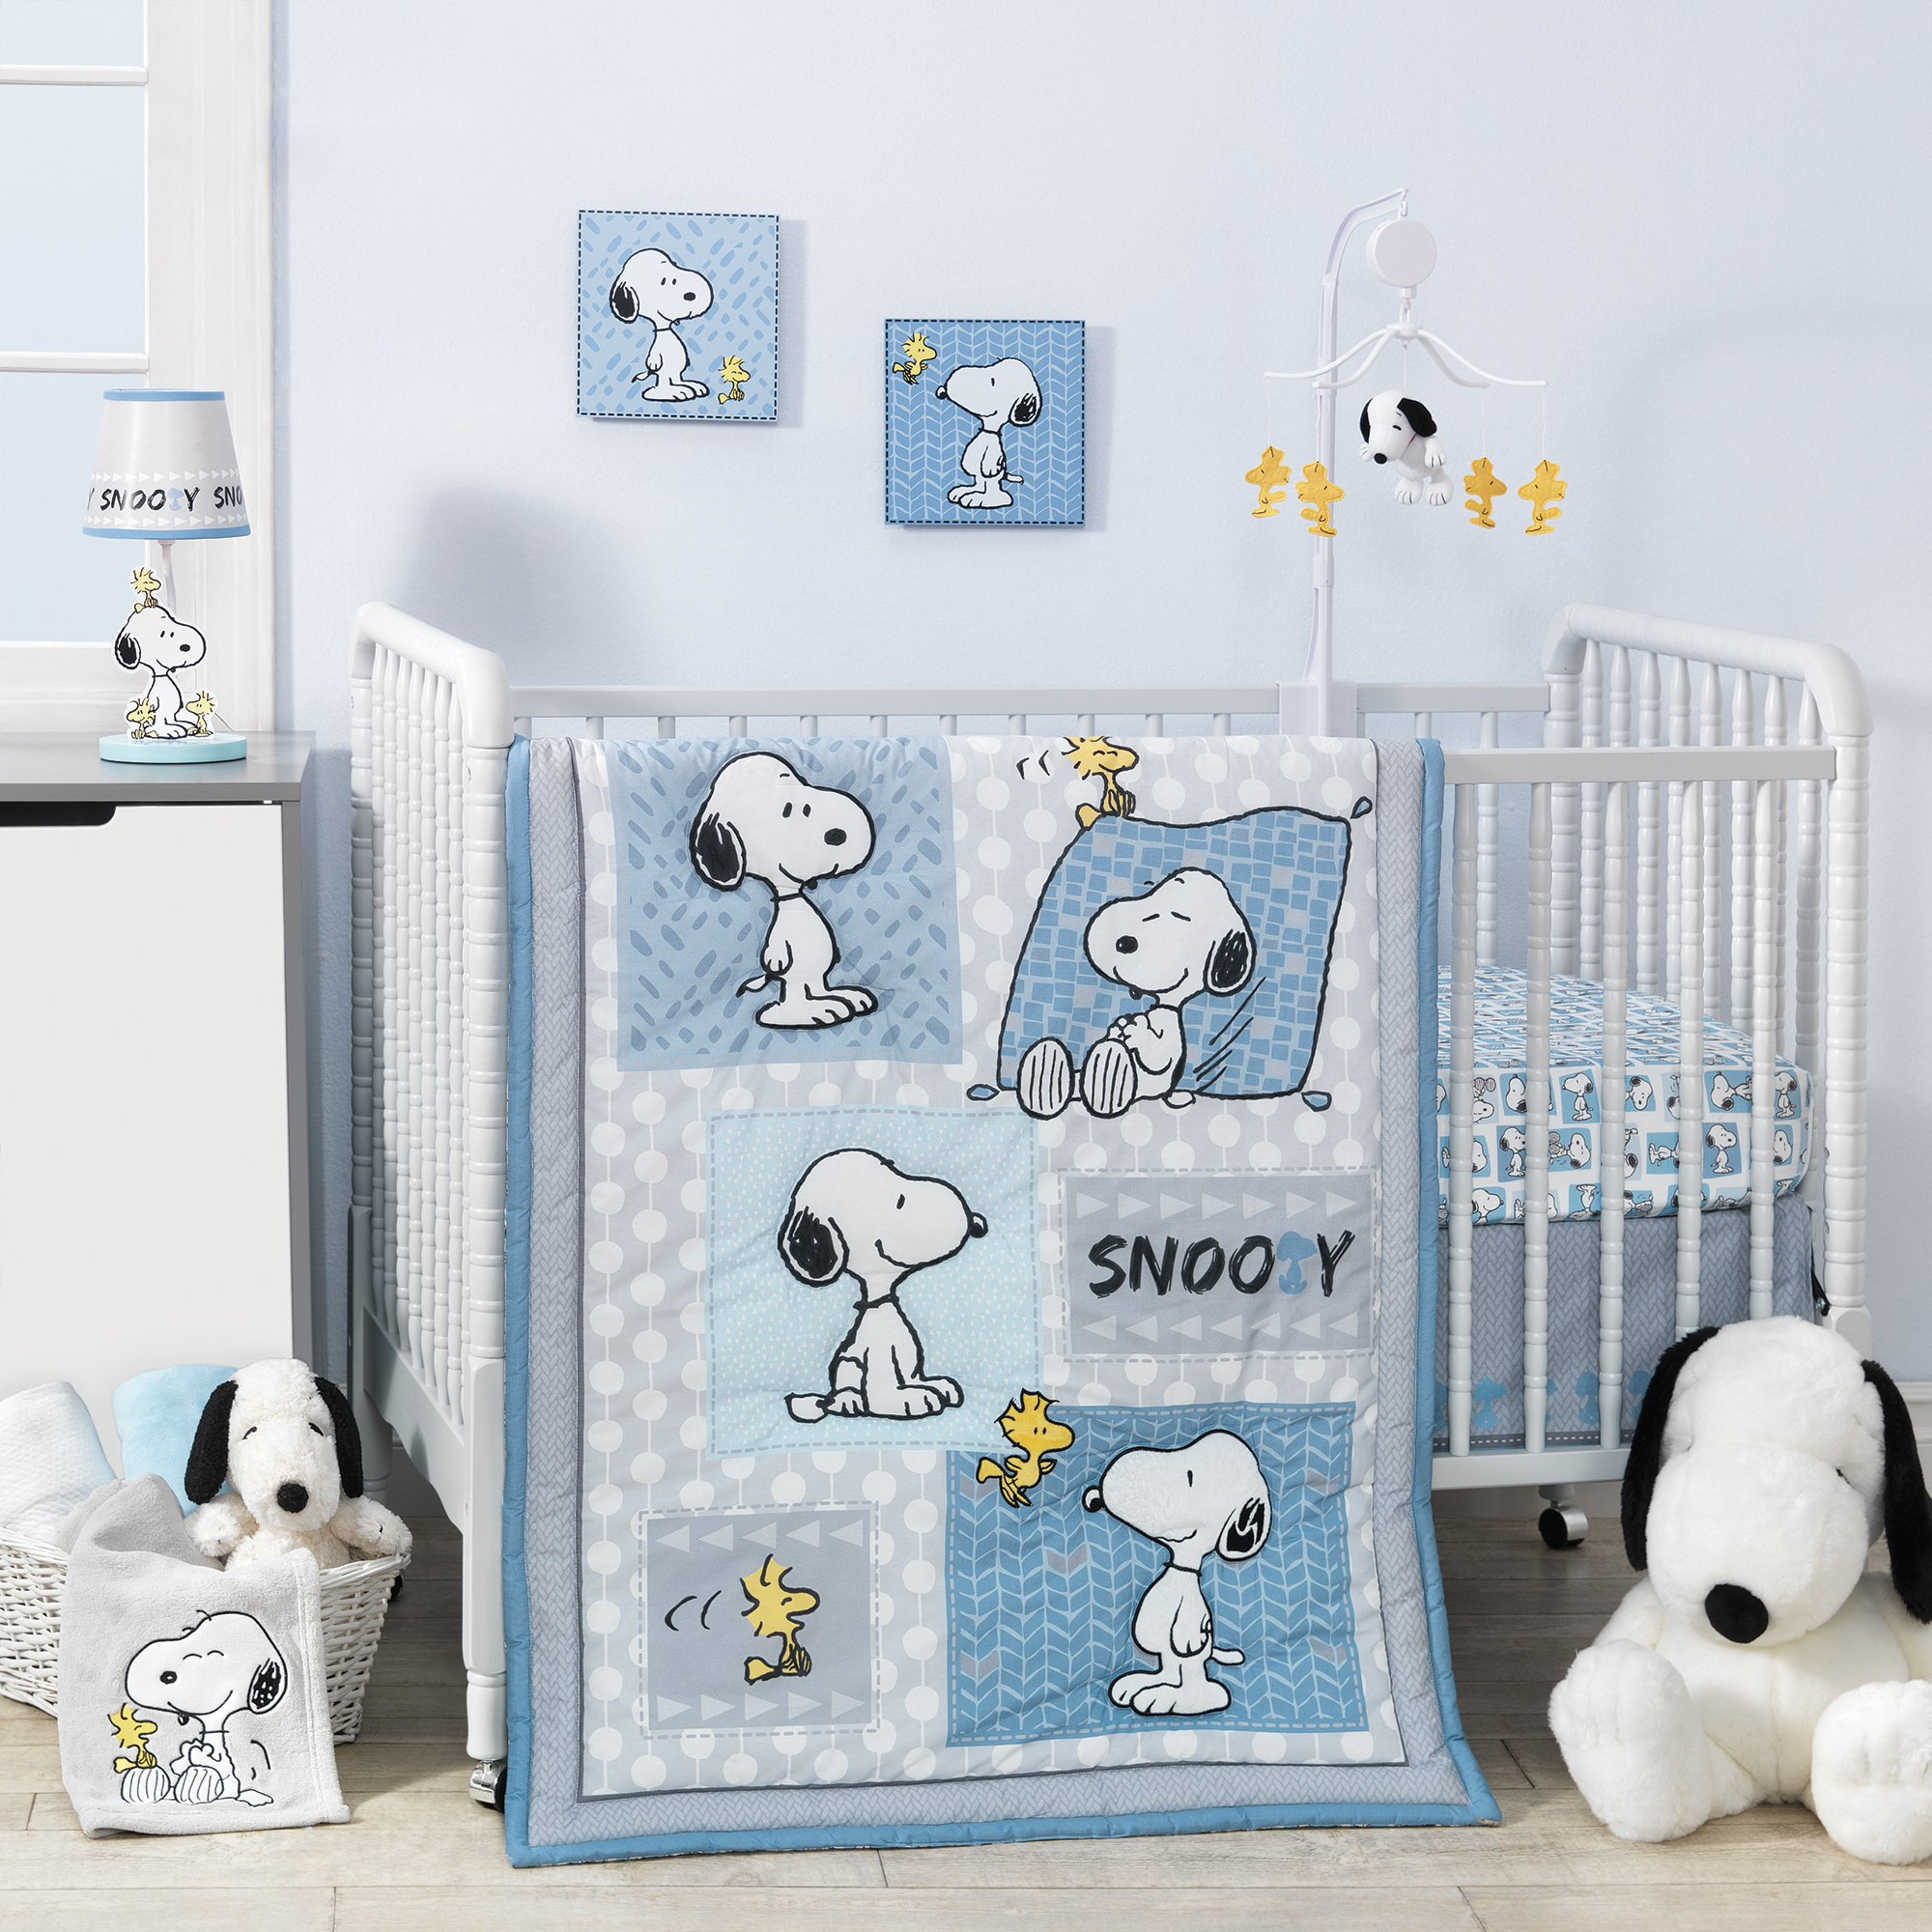 Bedtime Originals Peanuts Forever Snoopy 3 Piece Crib Bedding Set, Blue/Gray